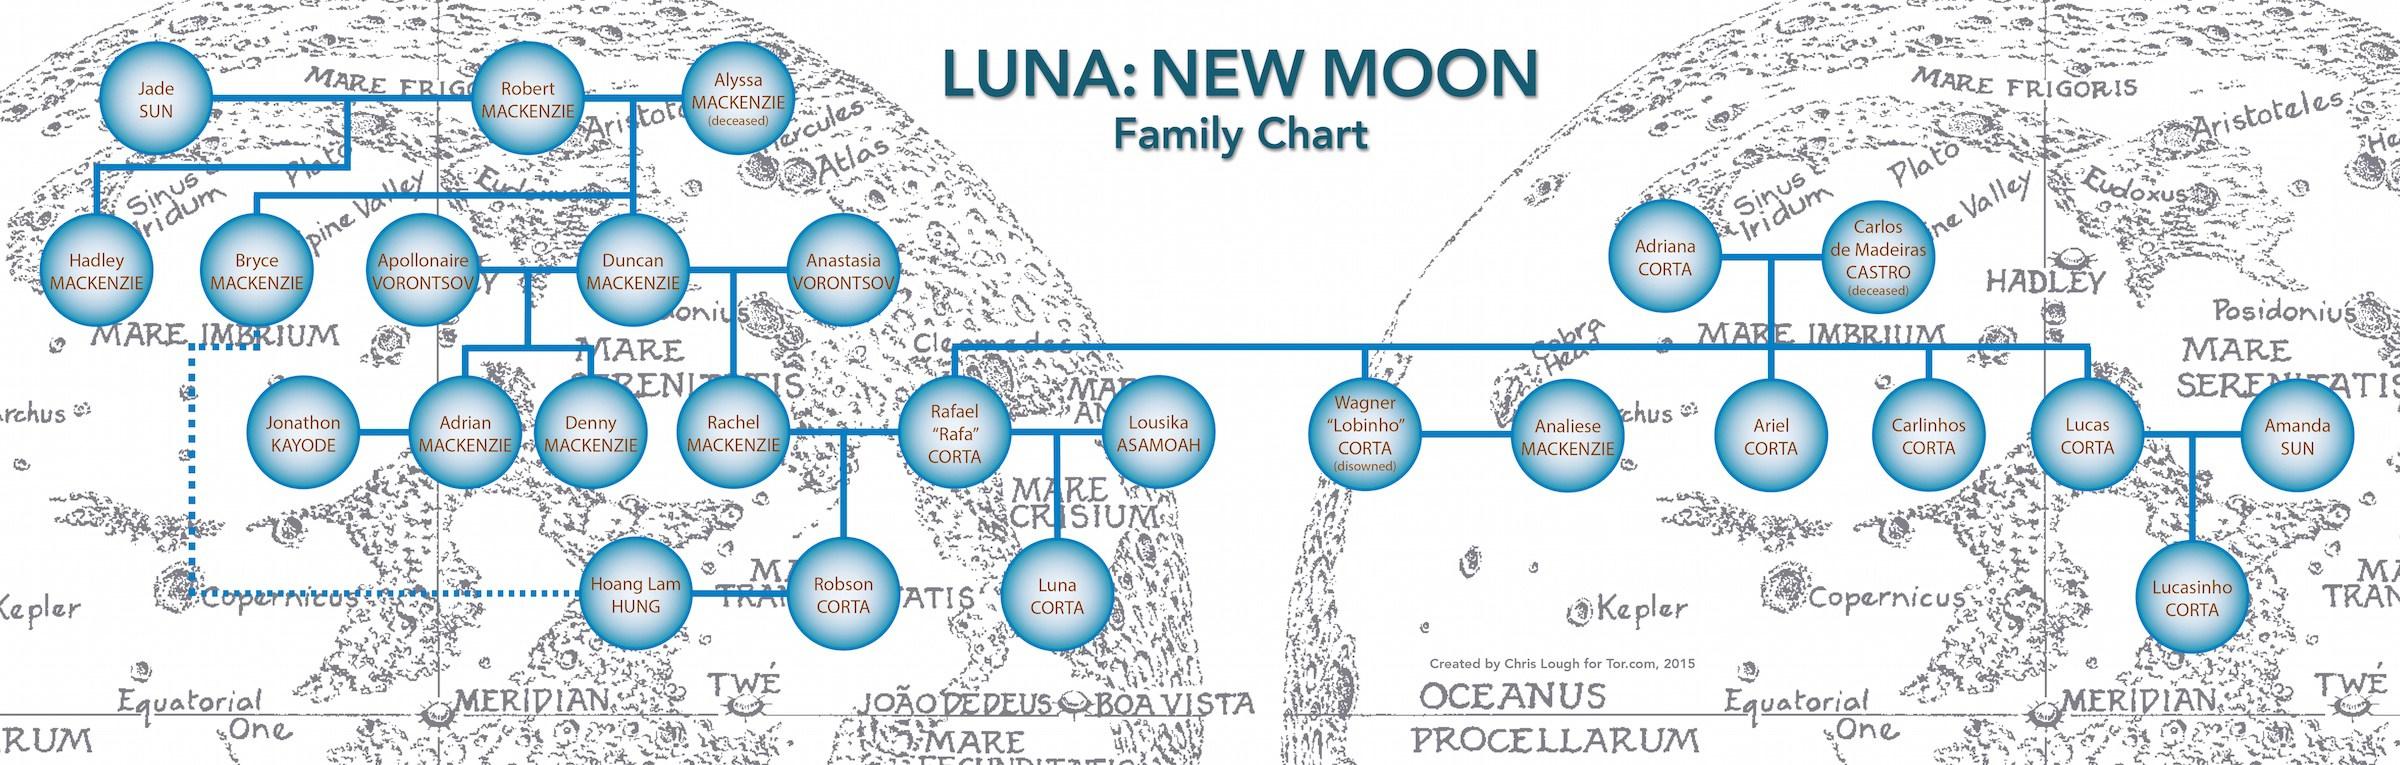 new-moon-family-chart.jpg